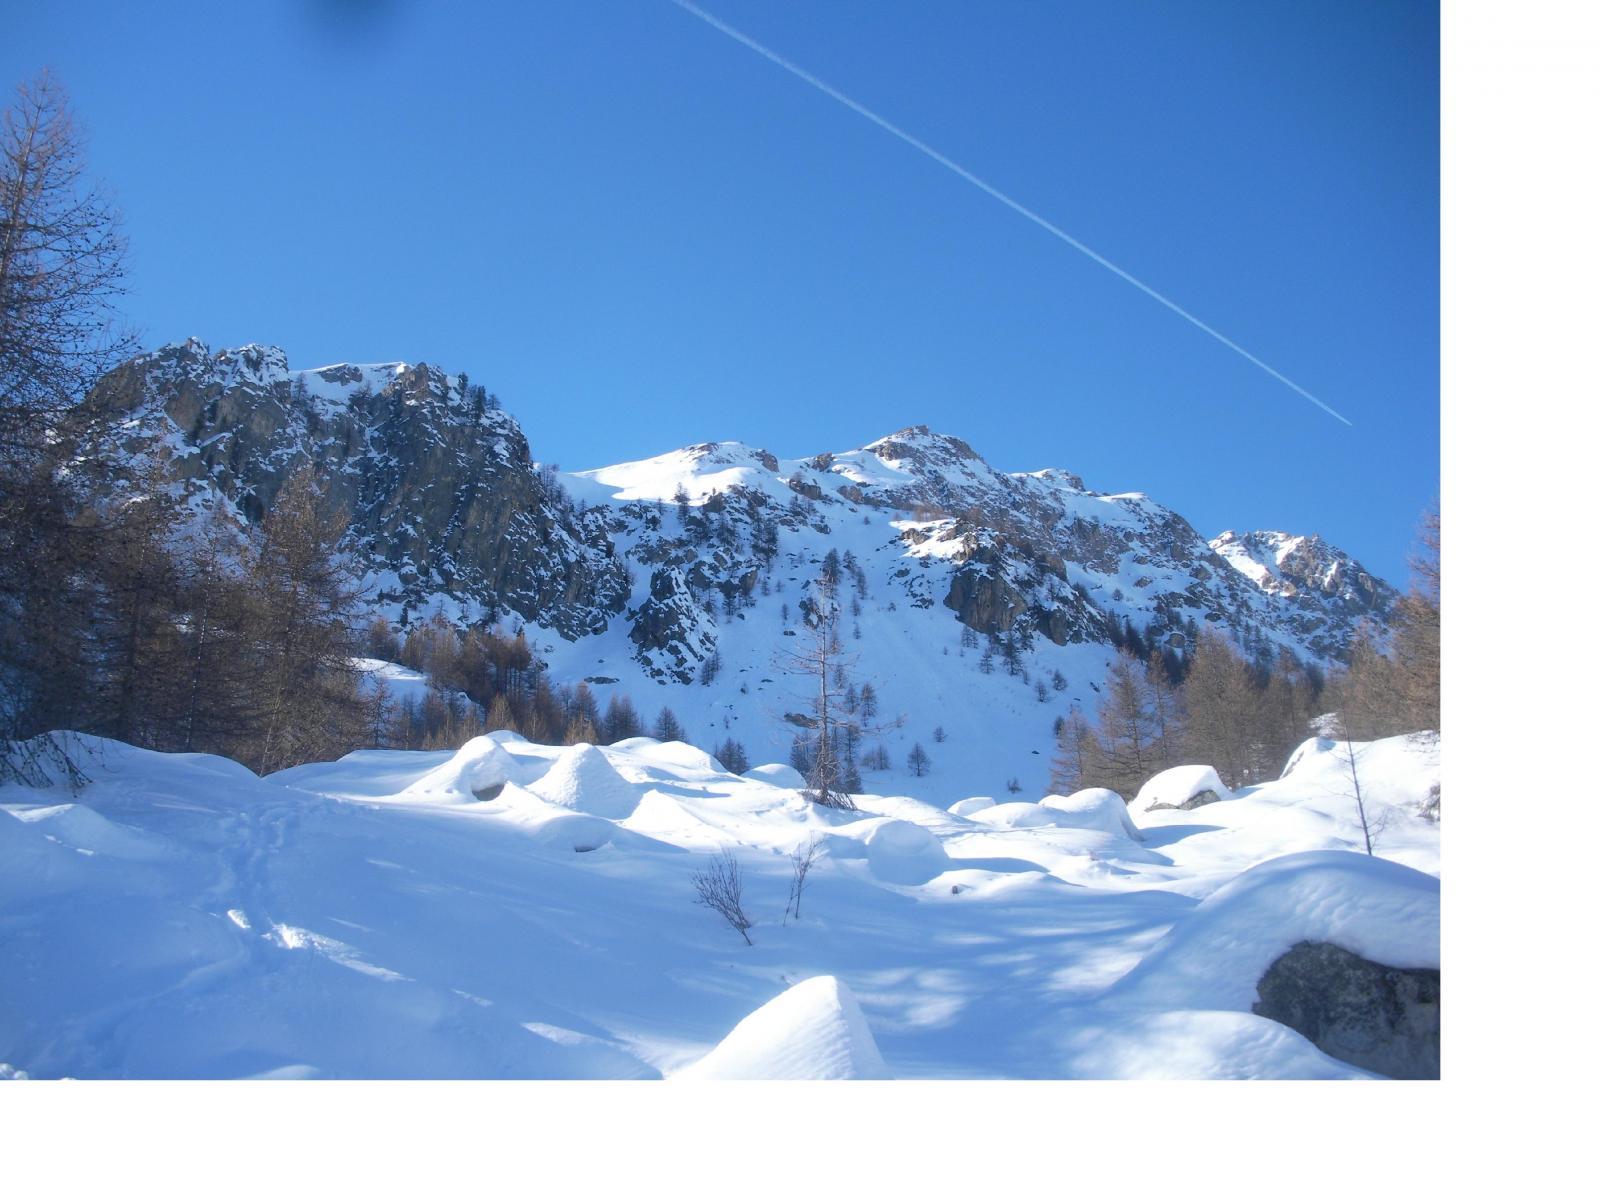 Ciarbonet (Cima) da Chialvetta 2014-01-12